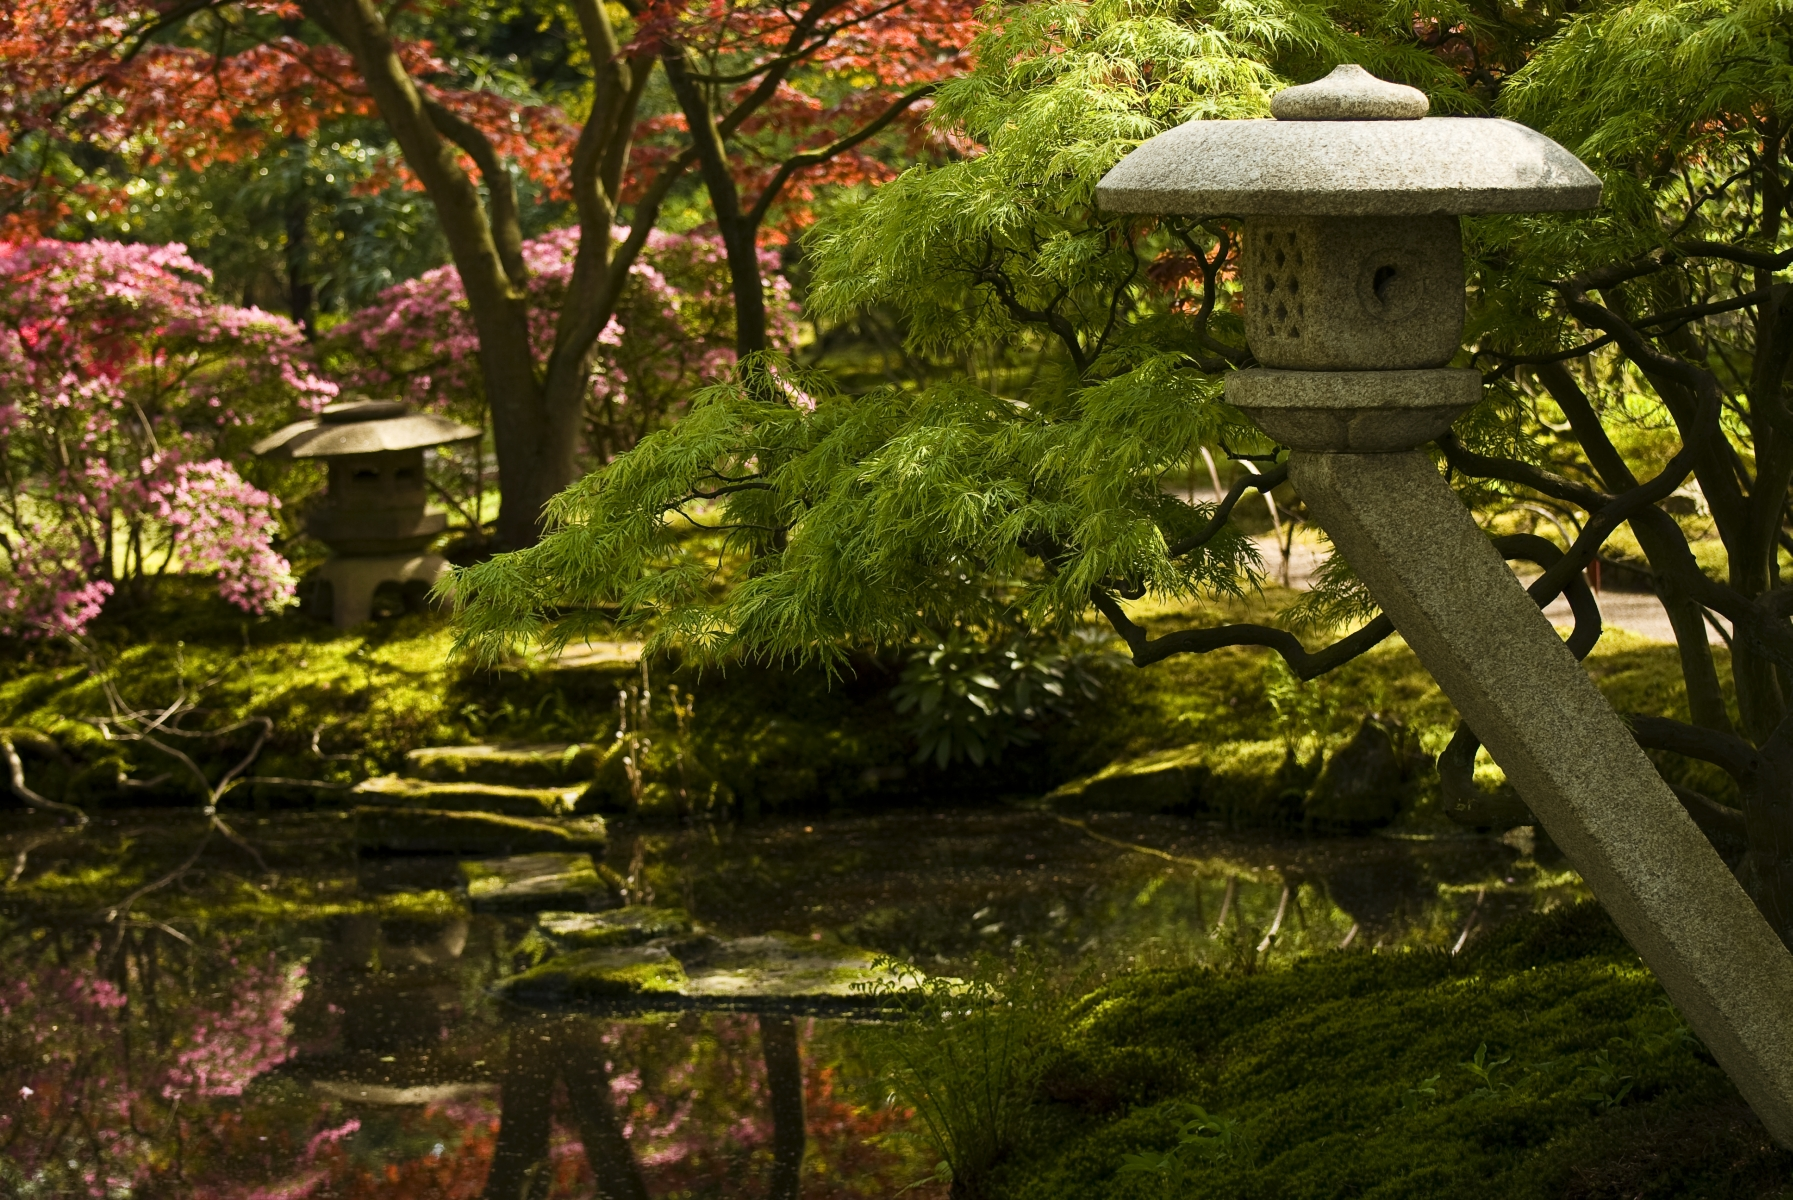 Japanese Garden in Park Clingendael, The Hague, Netherlands